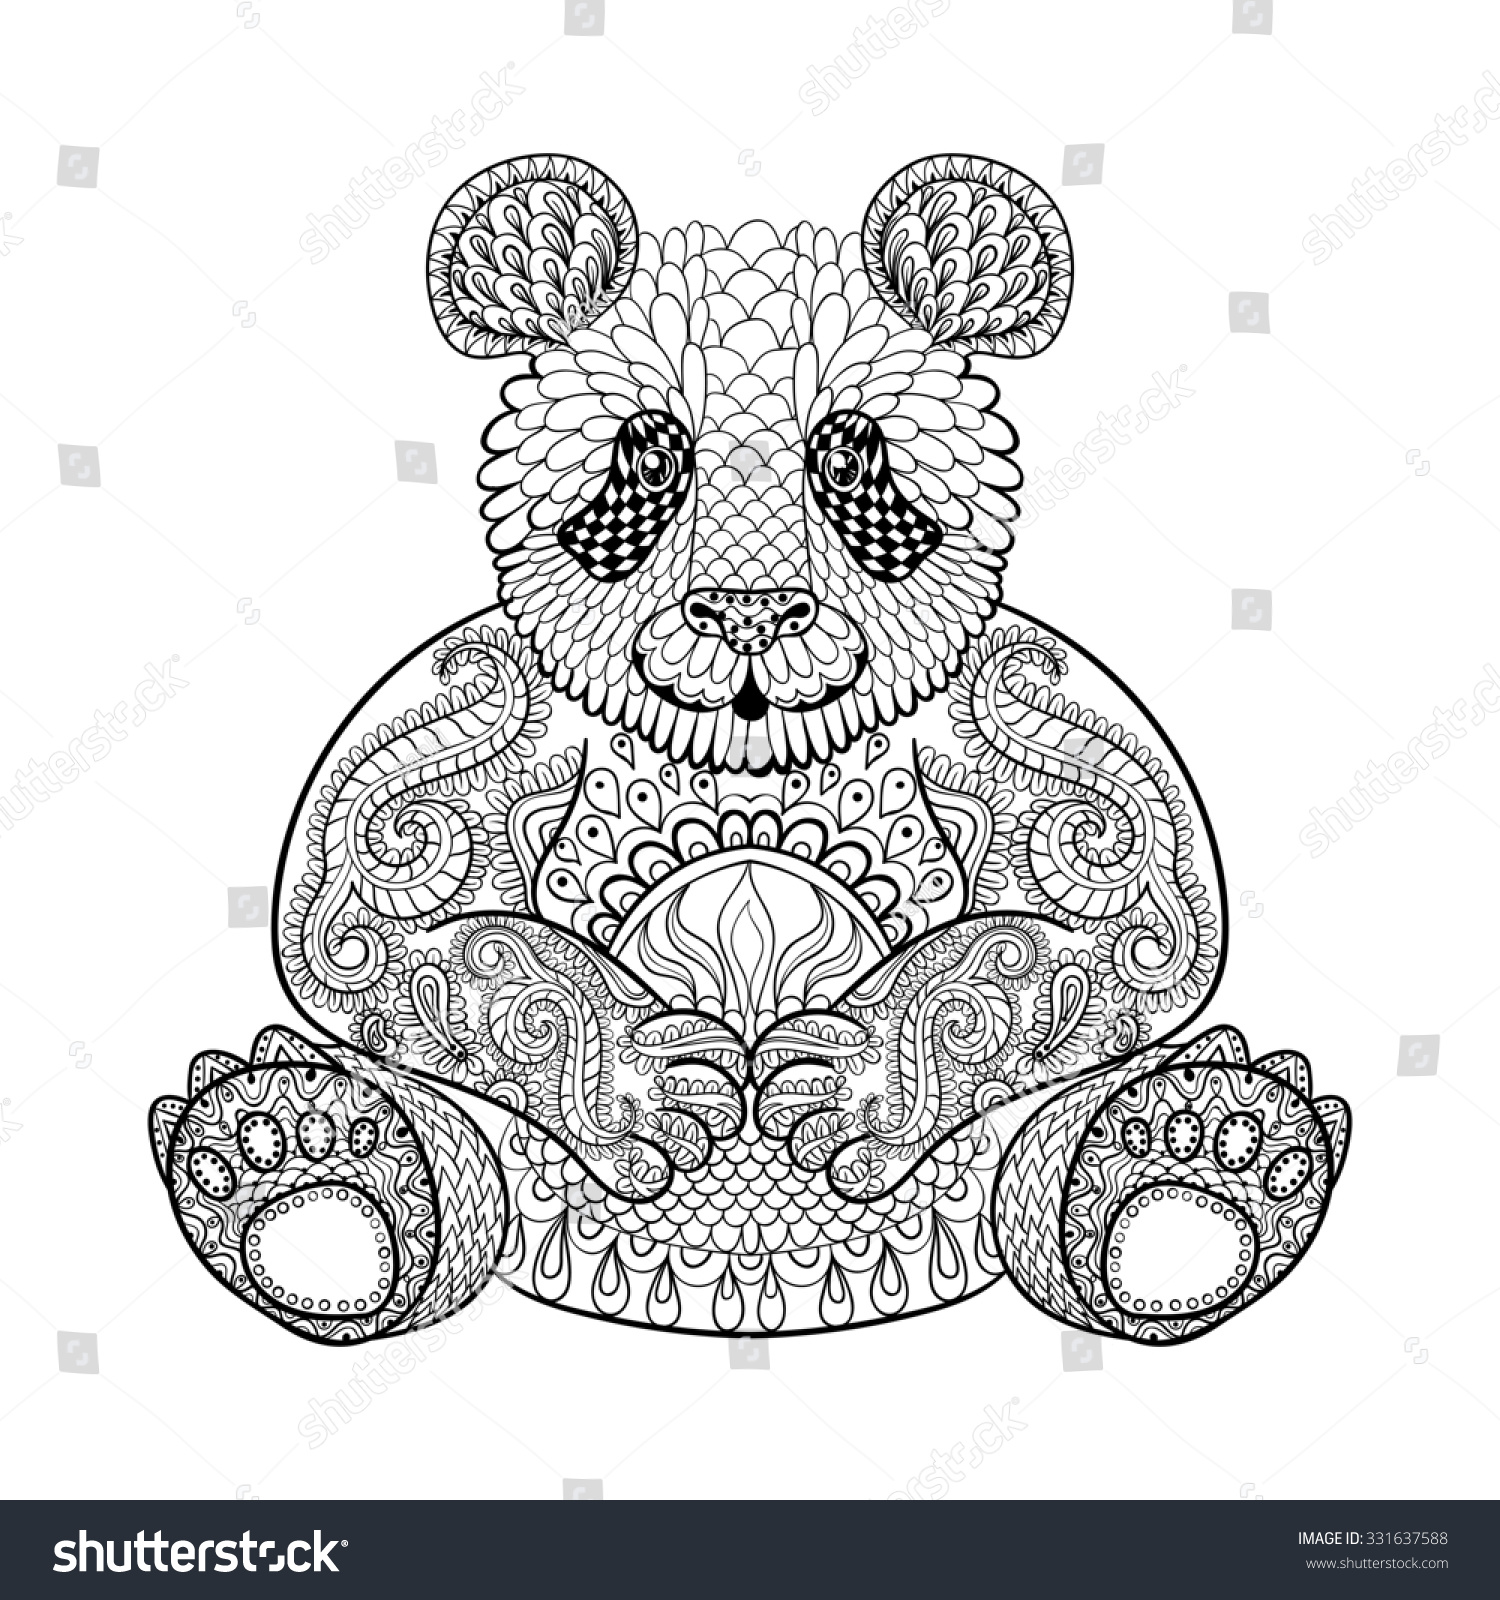 hand drawn tribal panda animal totem stock illustration 331637588